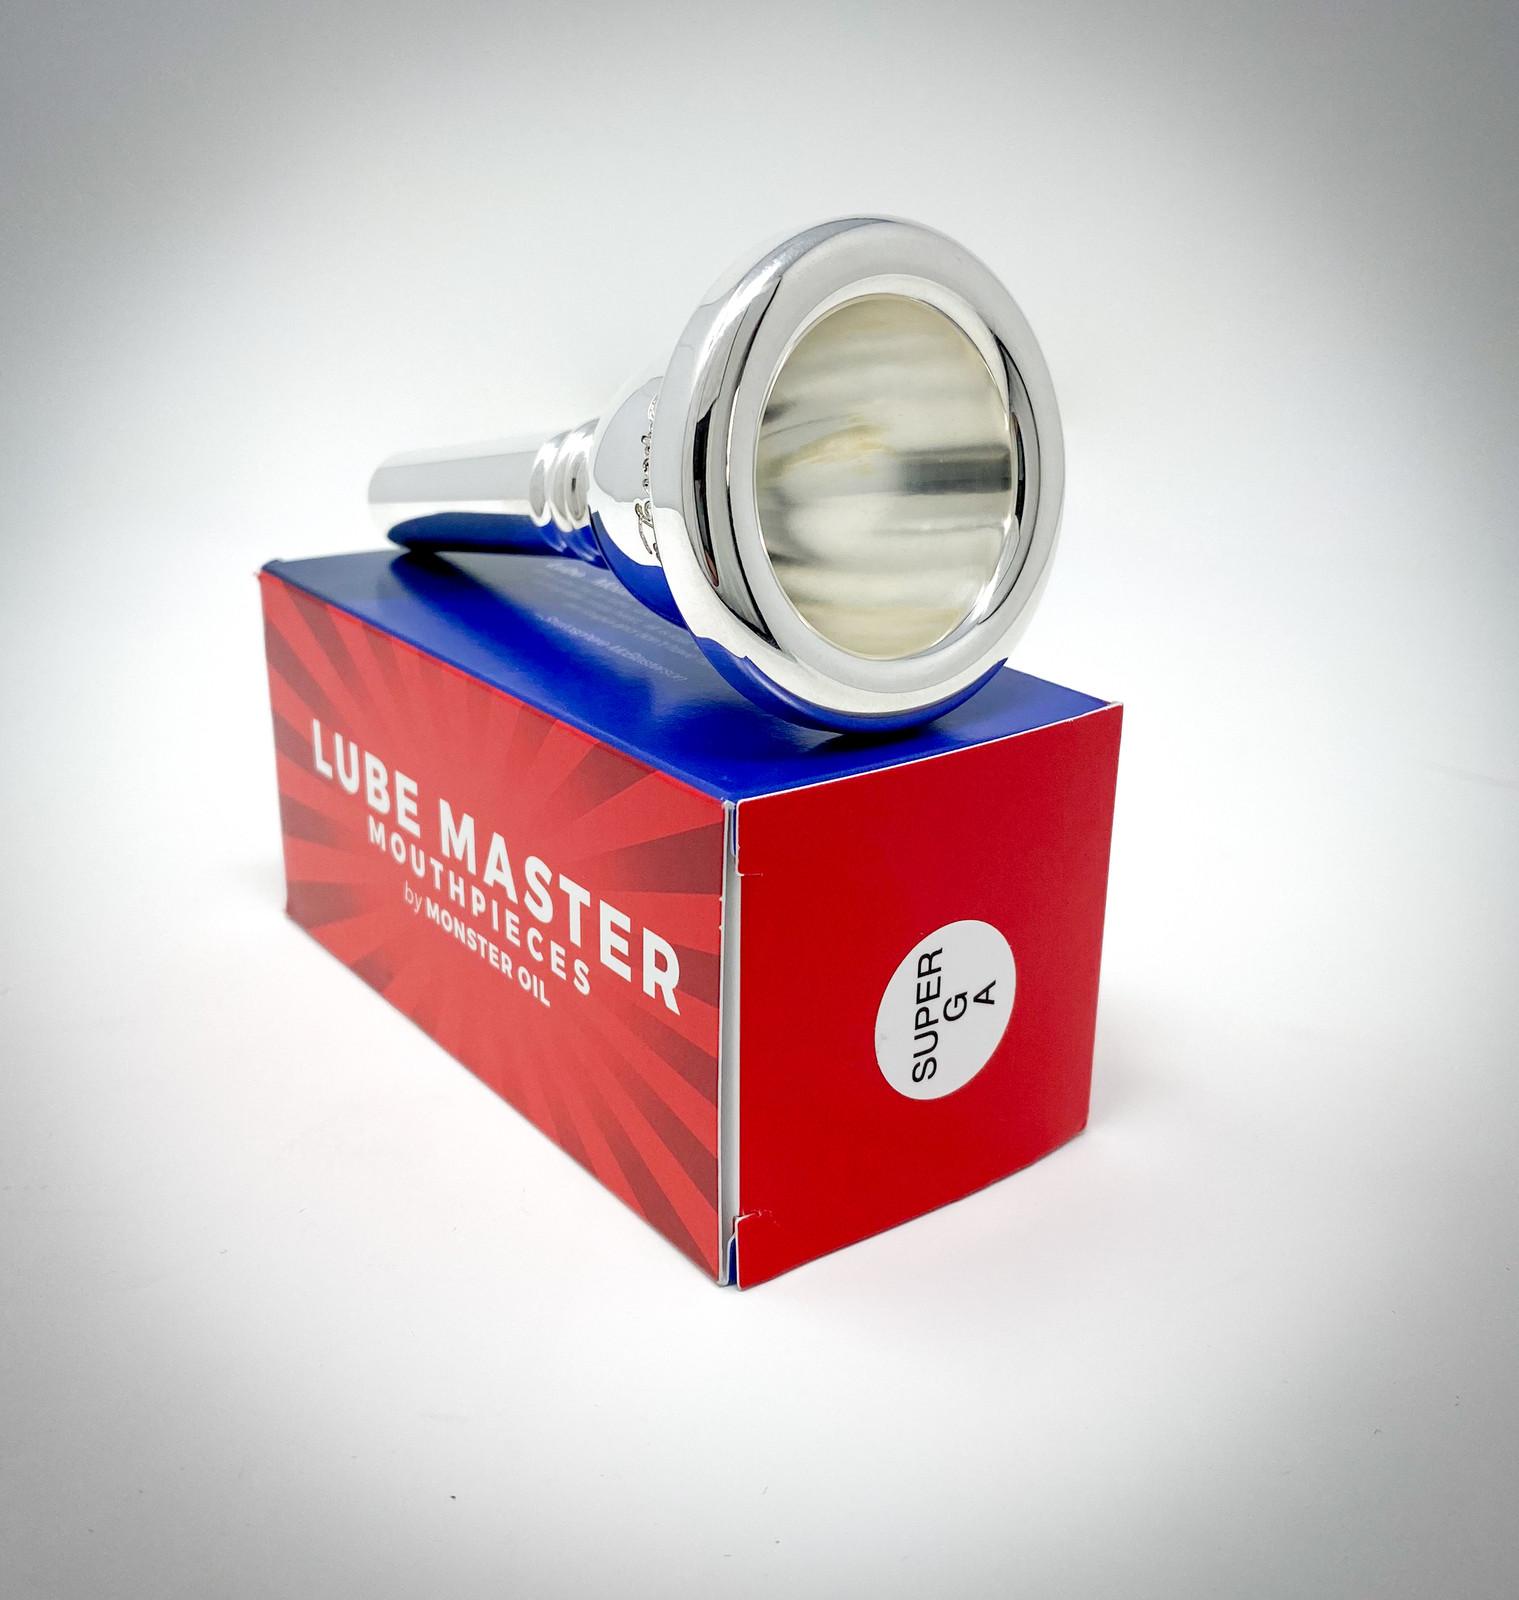 Lube Master 'Super G' Tuba Mouthpiece | American Shank